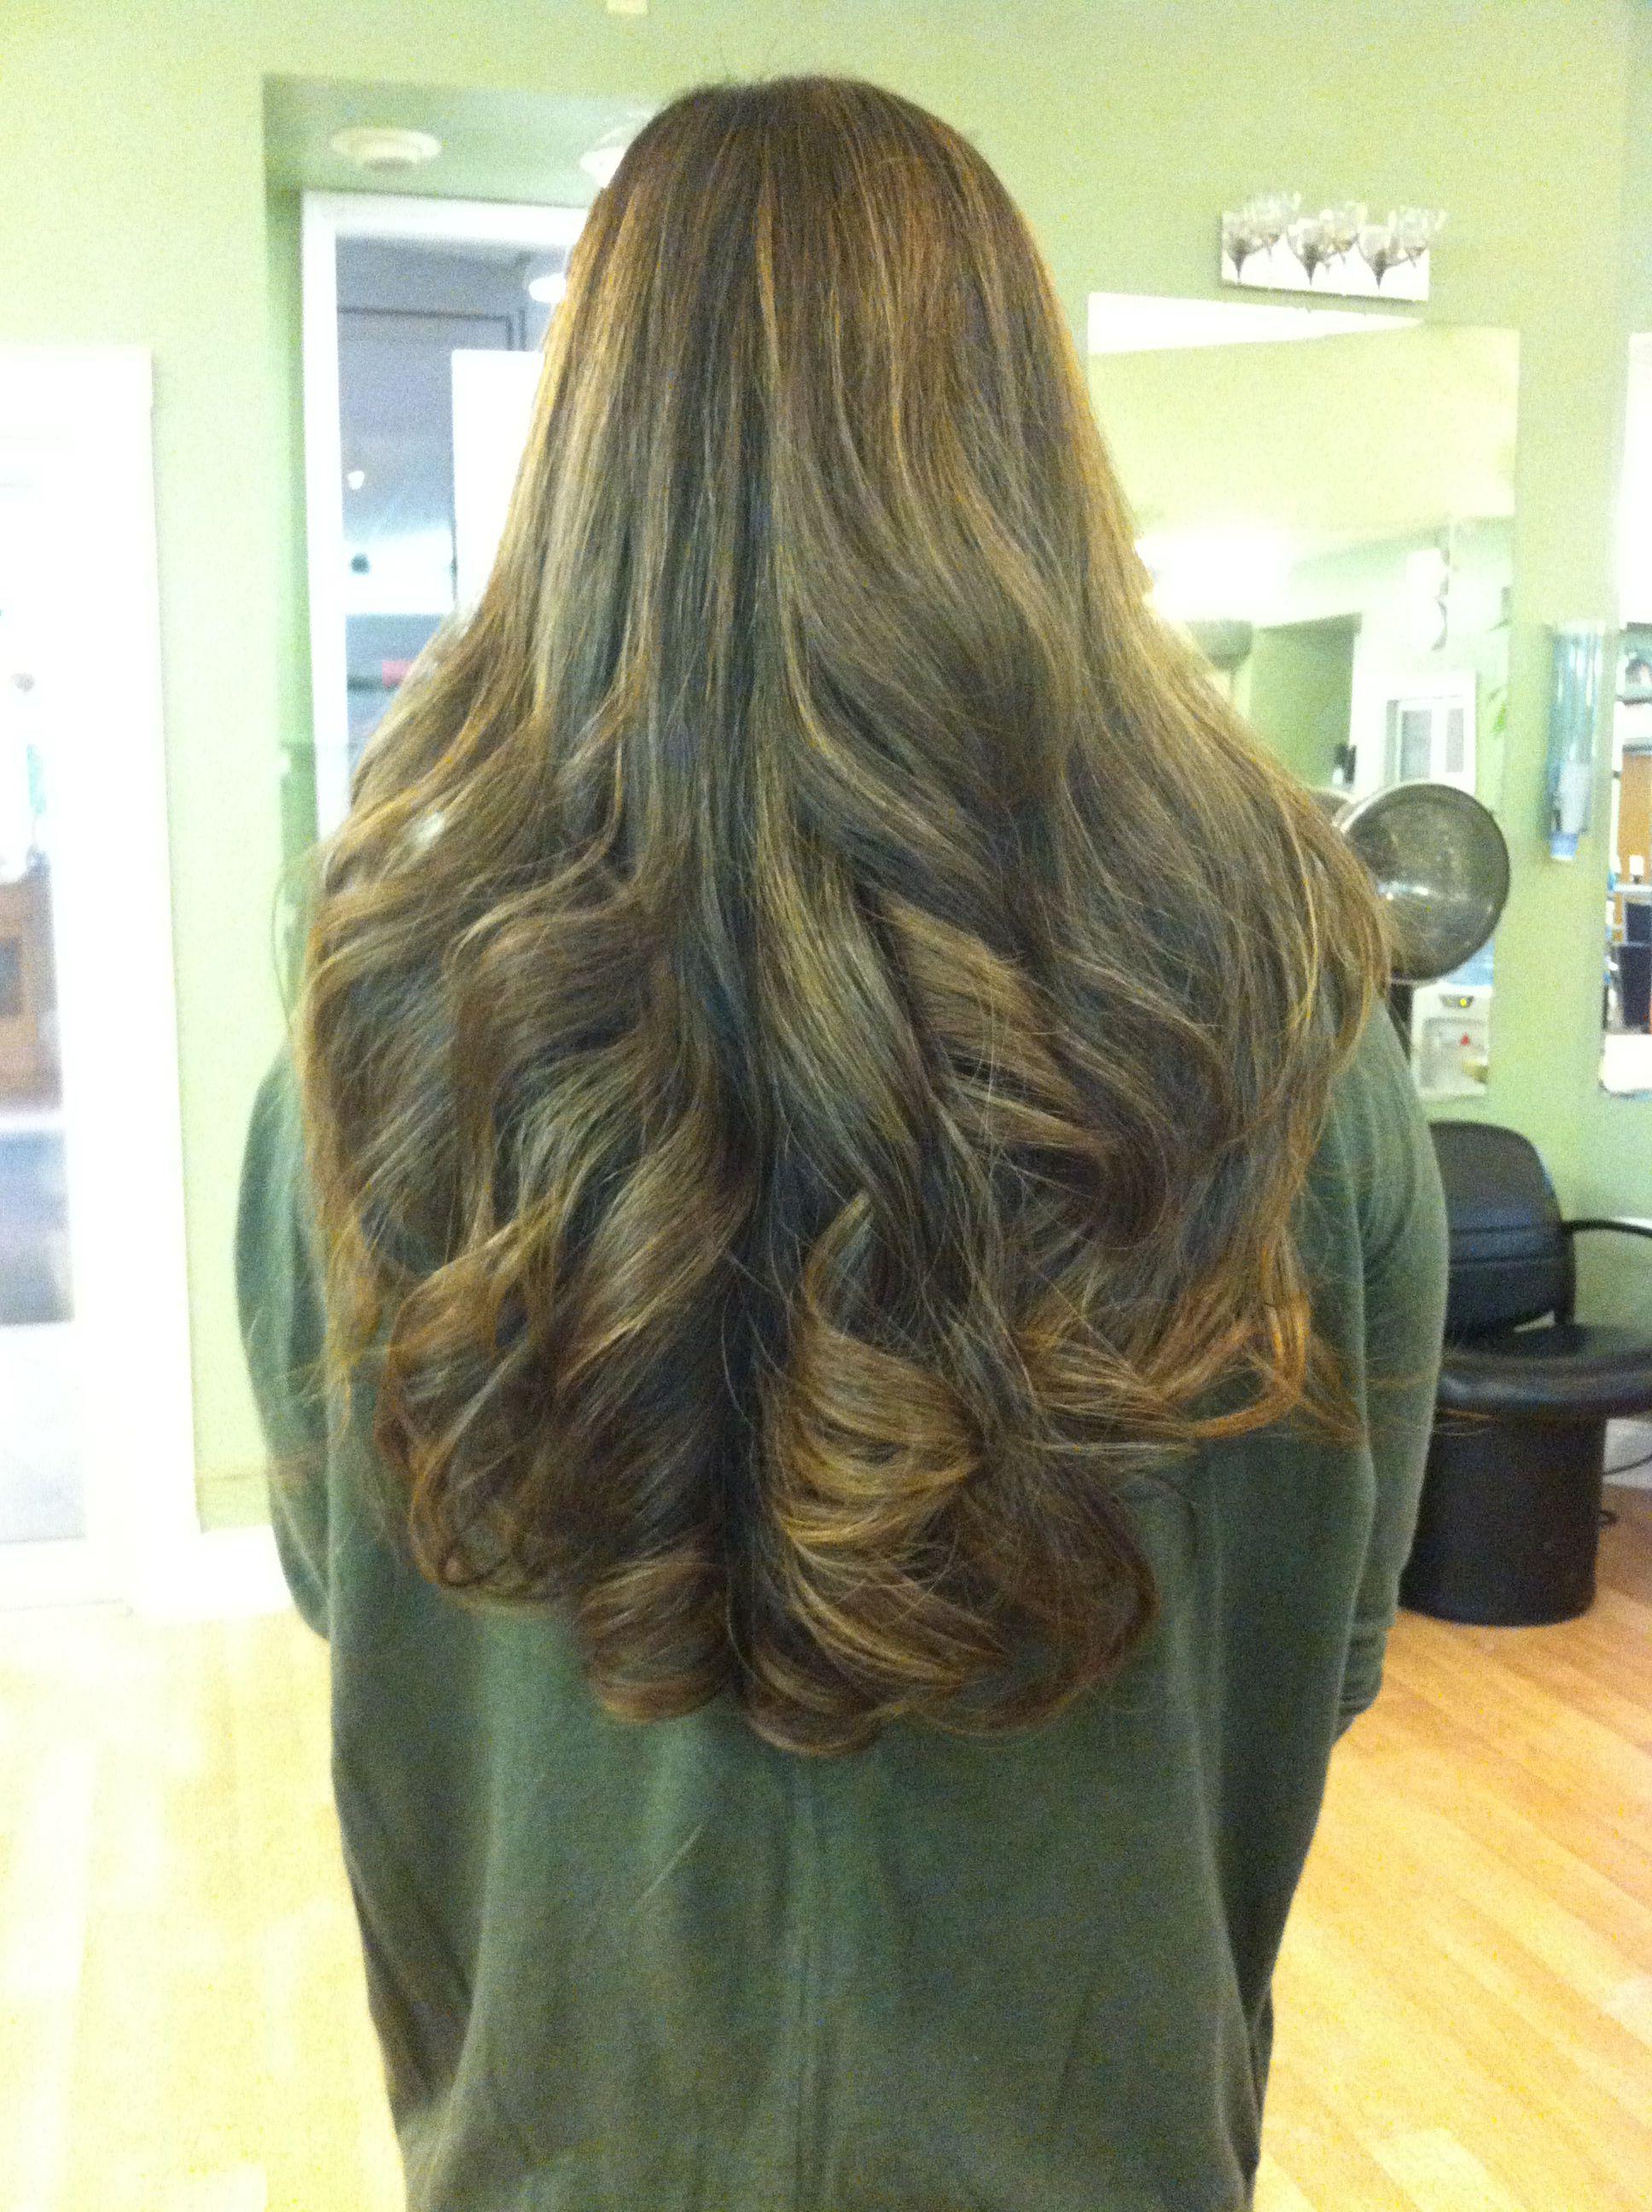 Long Carmel brown hair